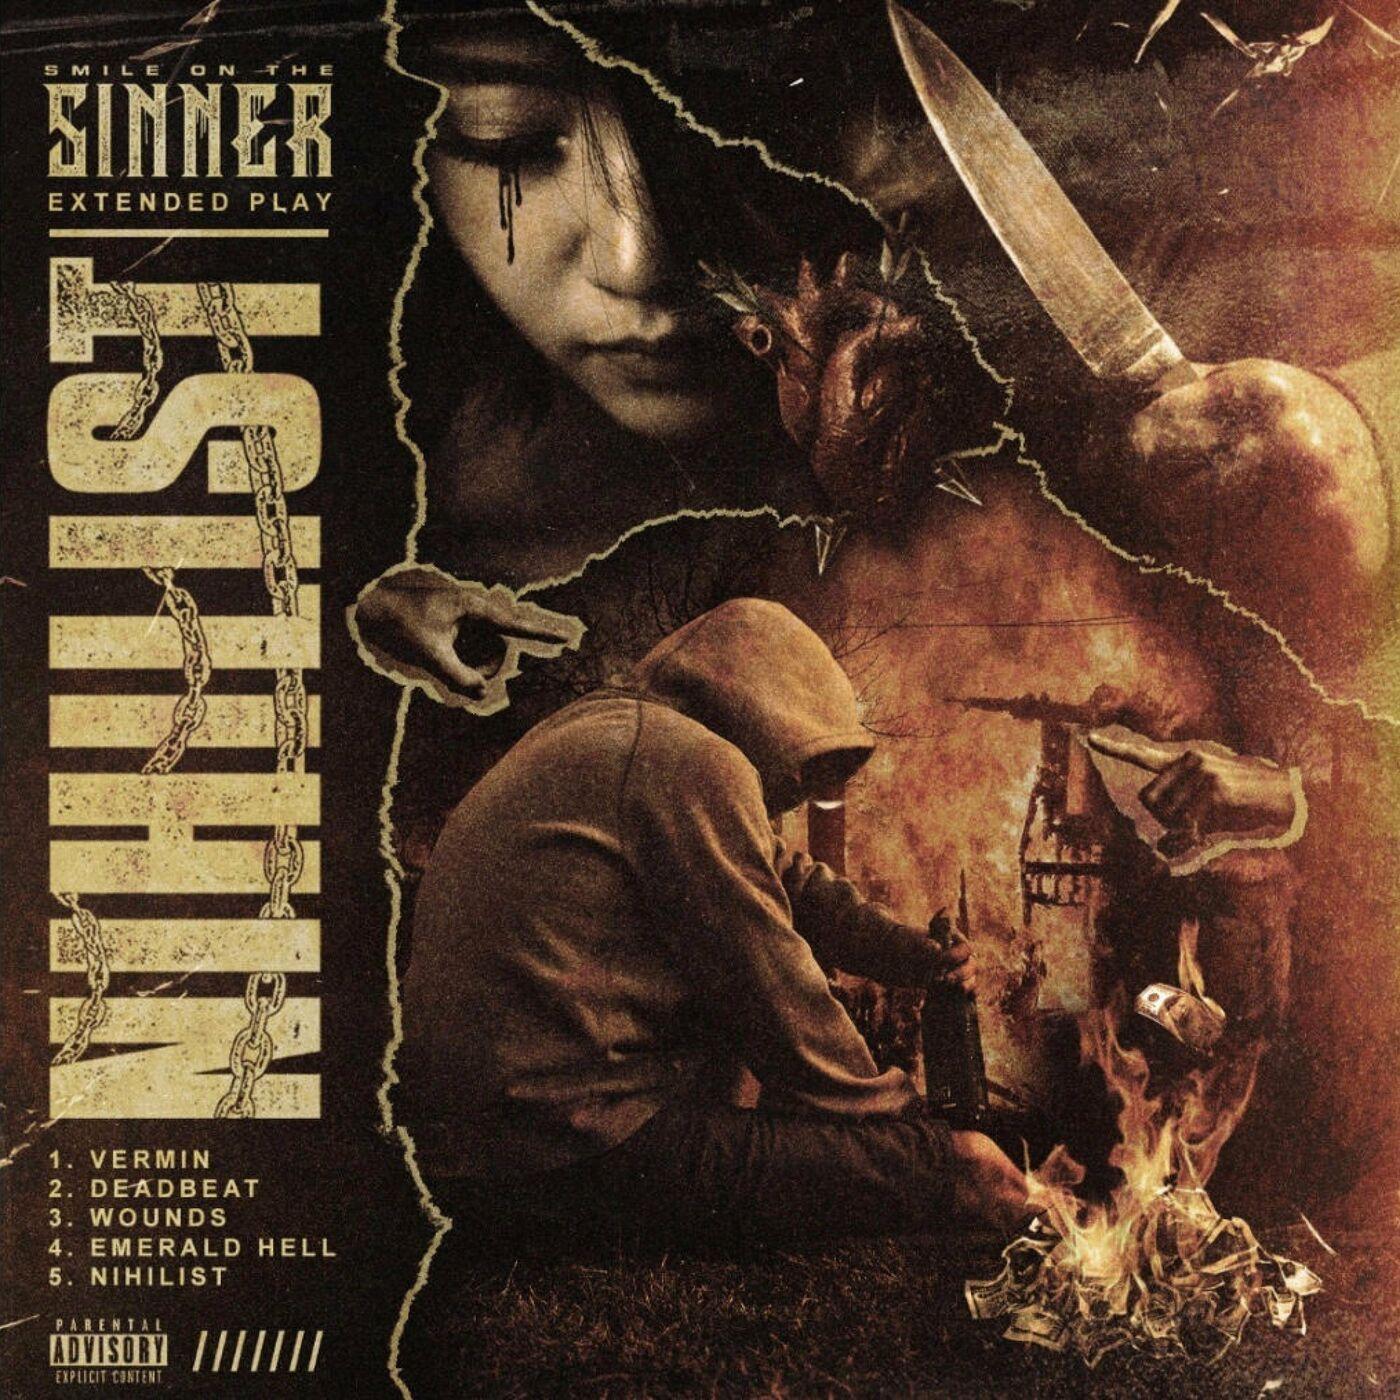 Smile on the Sinner - Vermin [single] (2021)